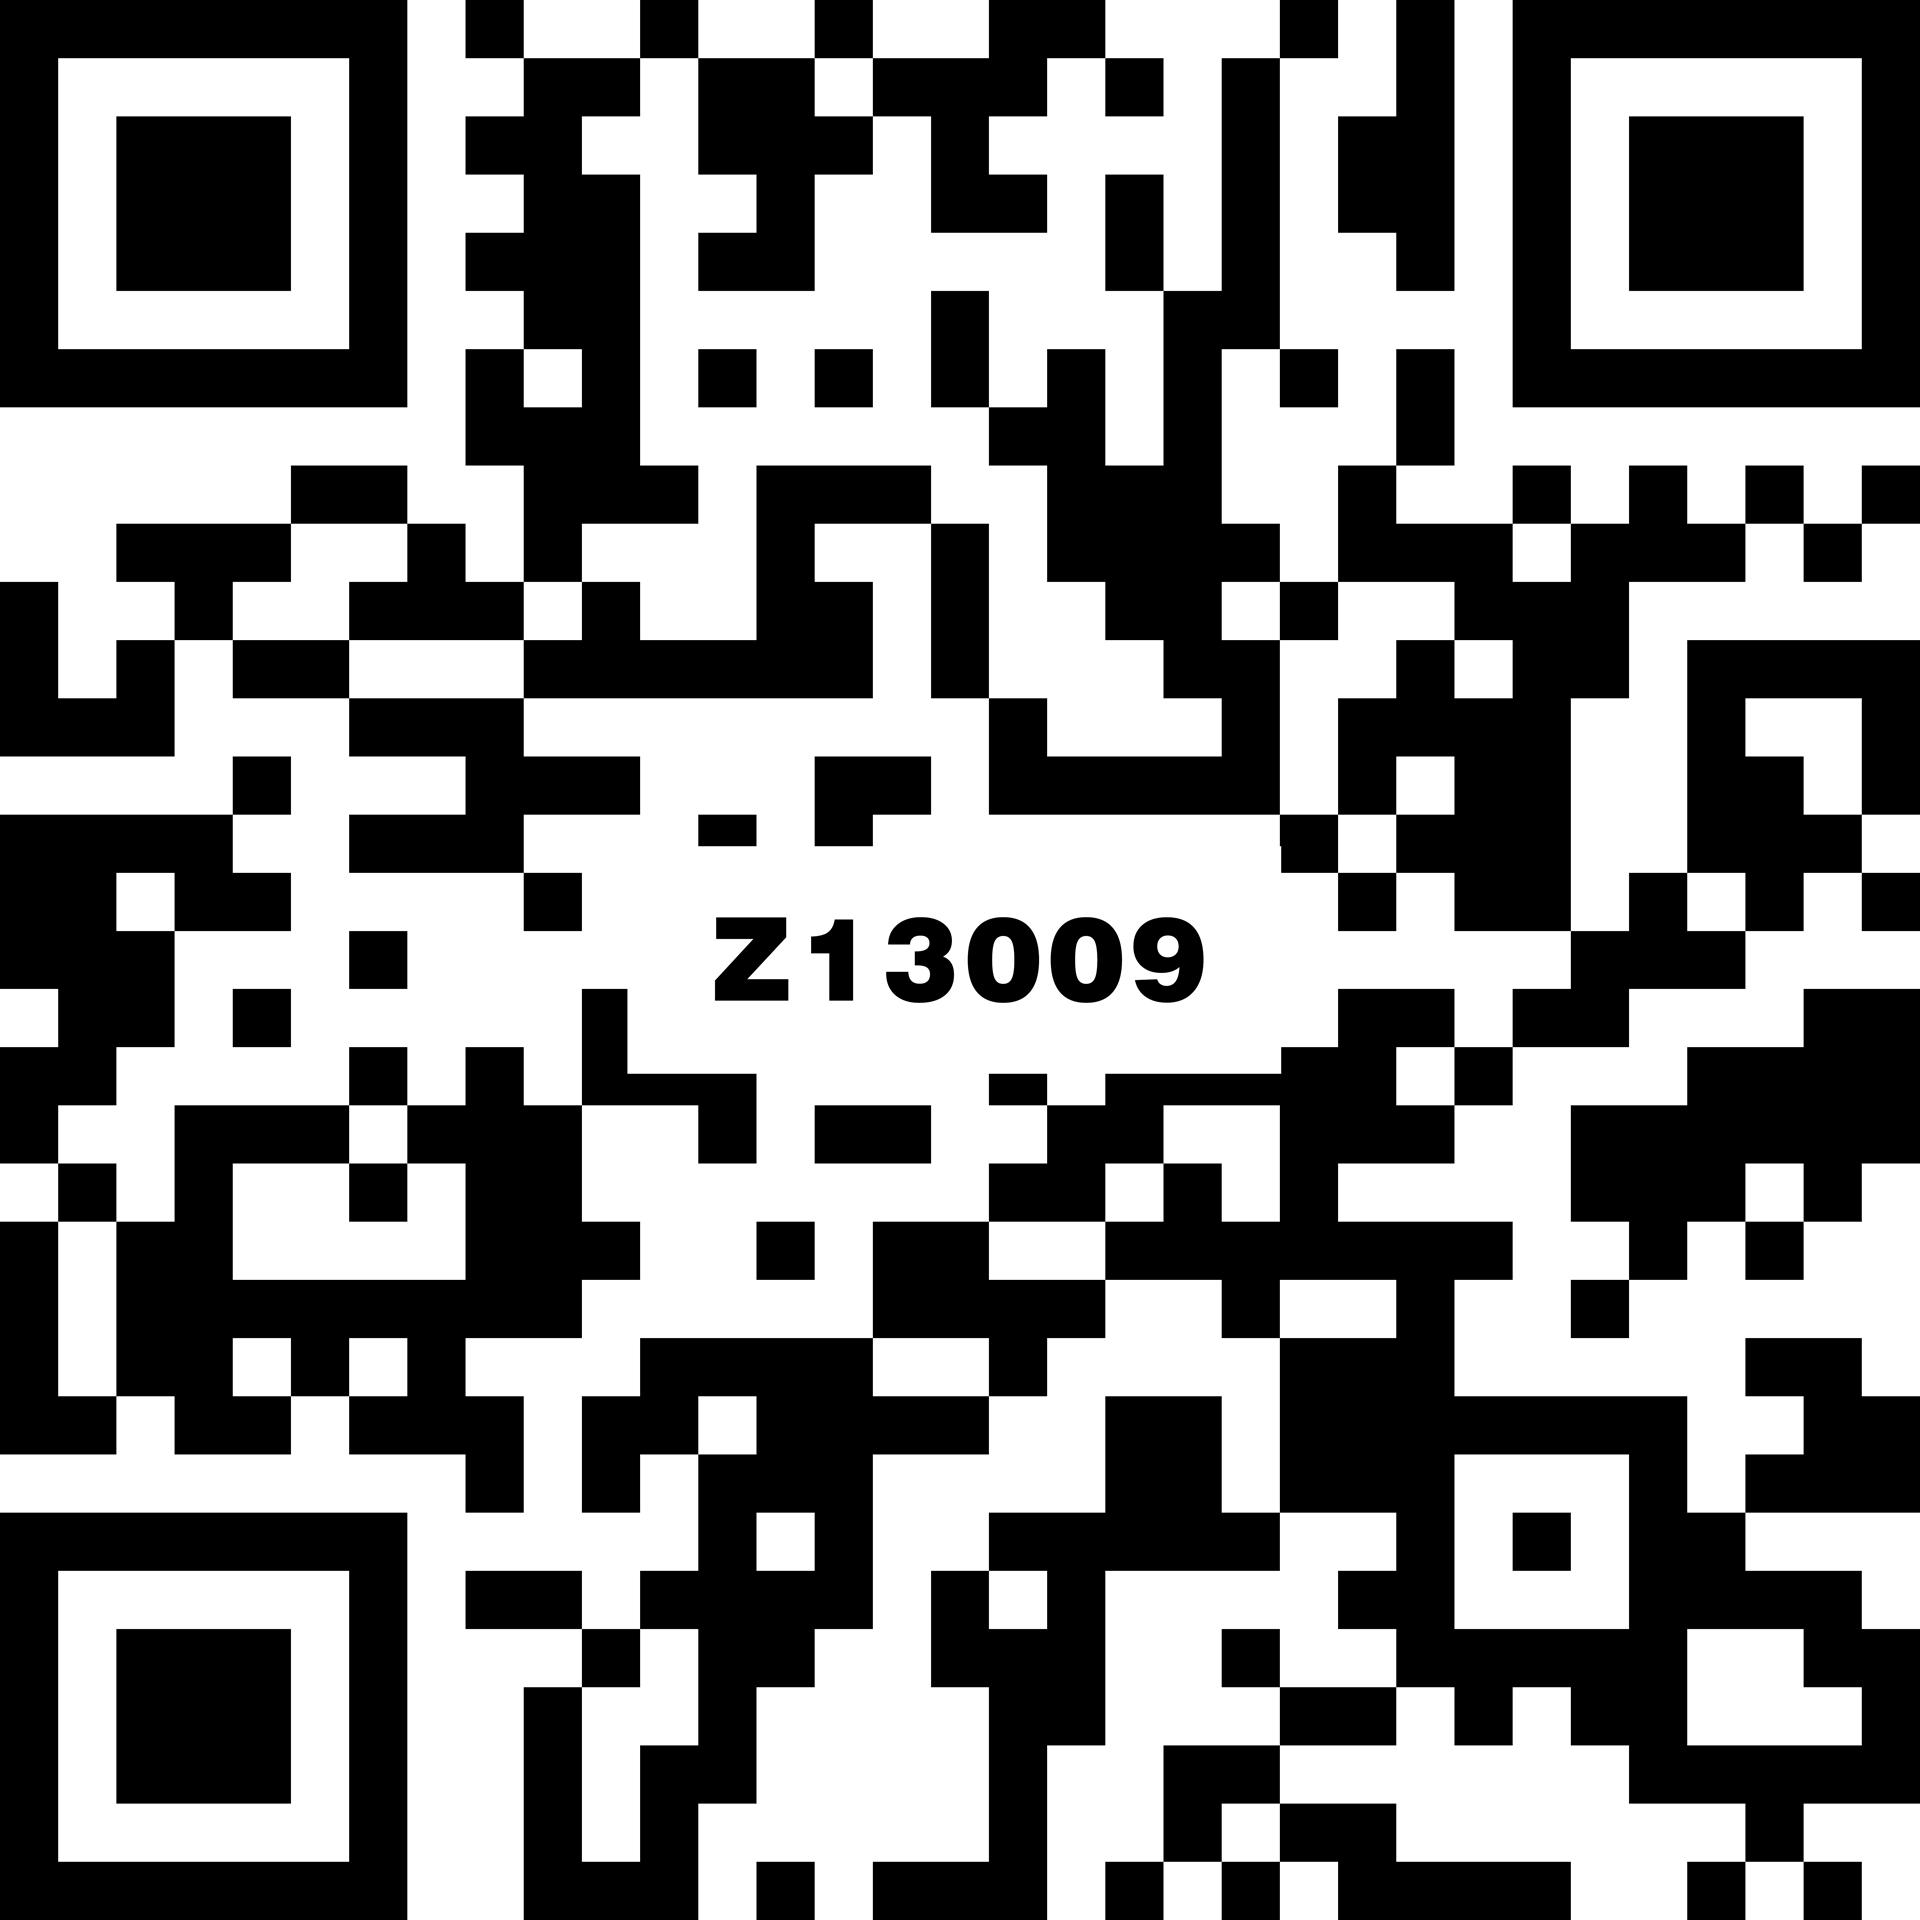 Z13009